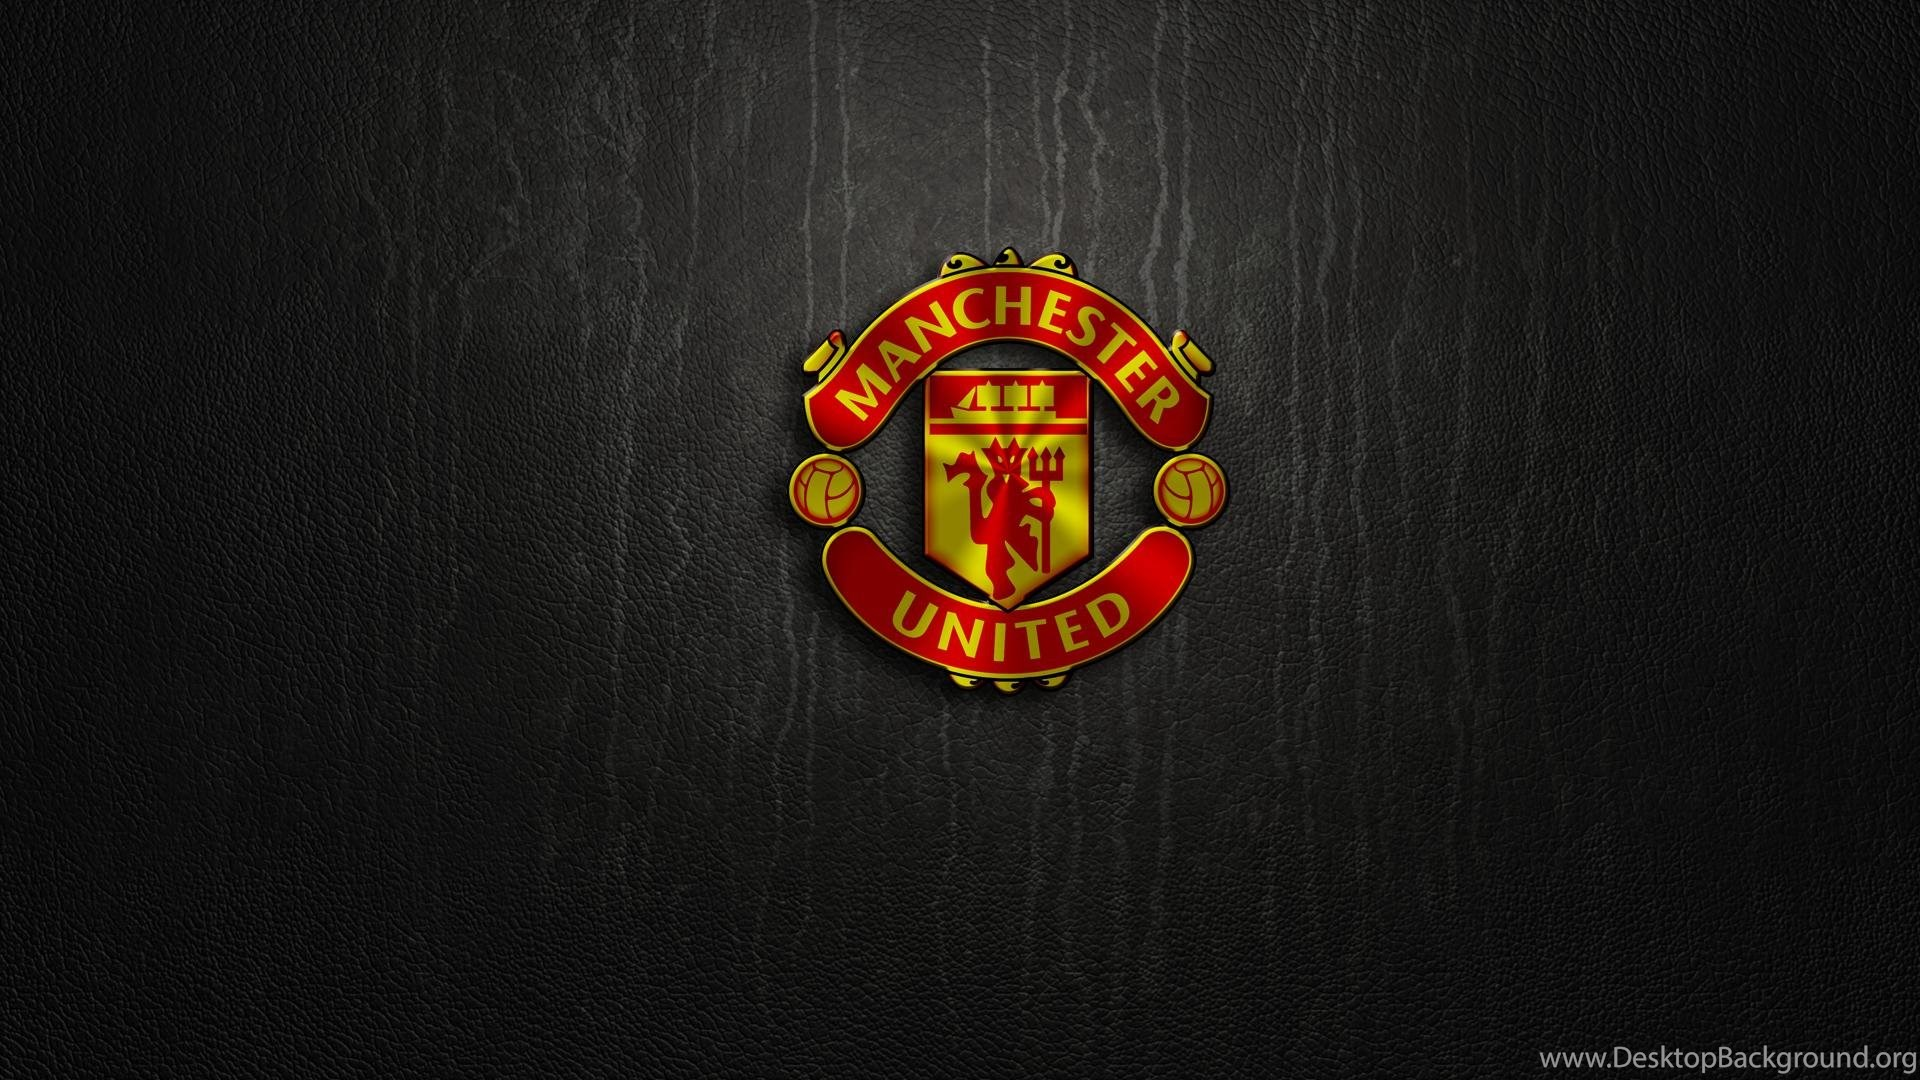 Manchester United Wallpapers Hd Desktop Background